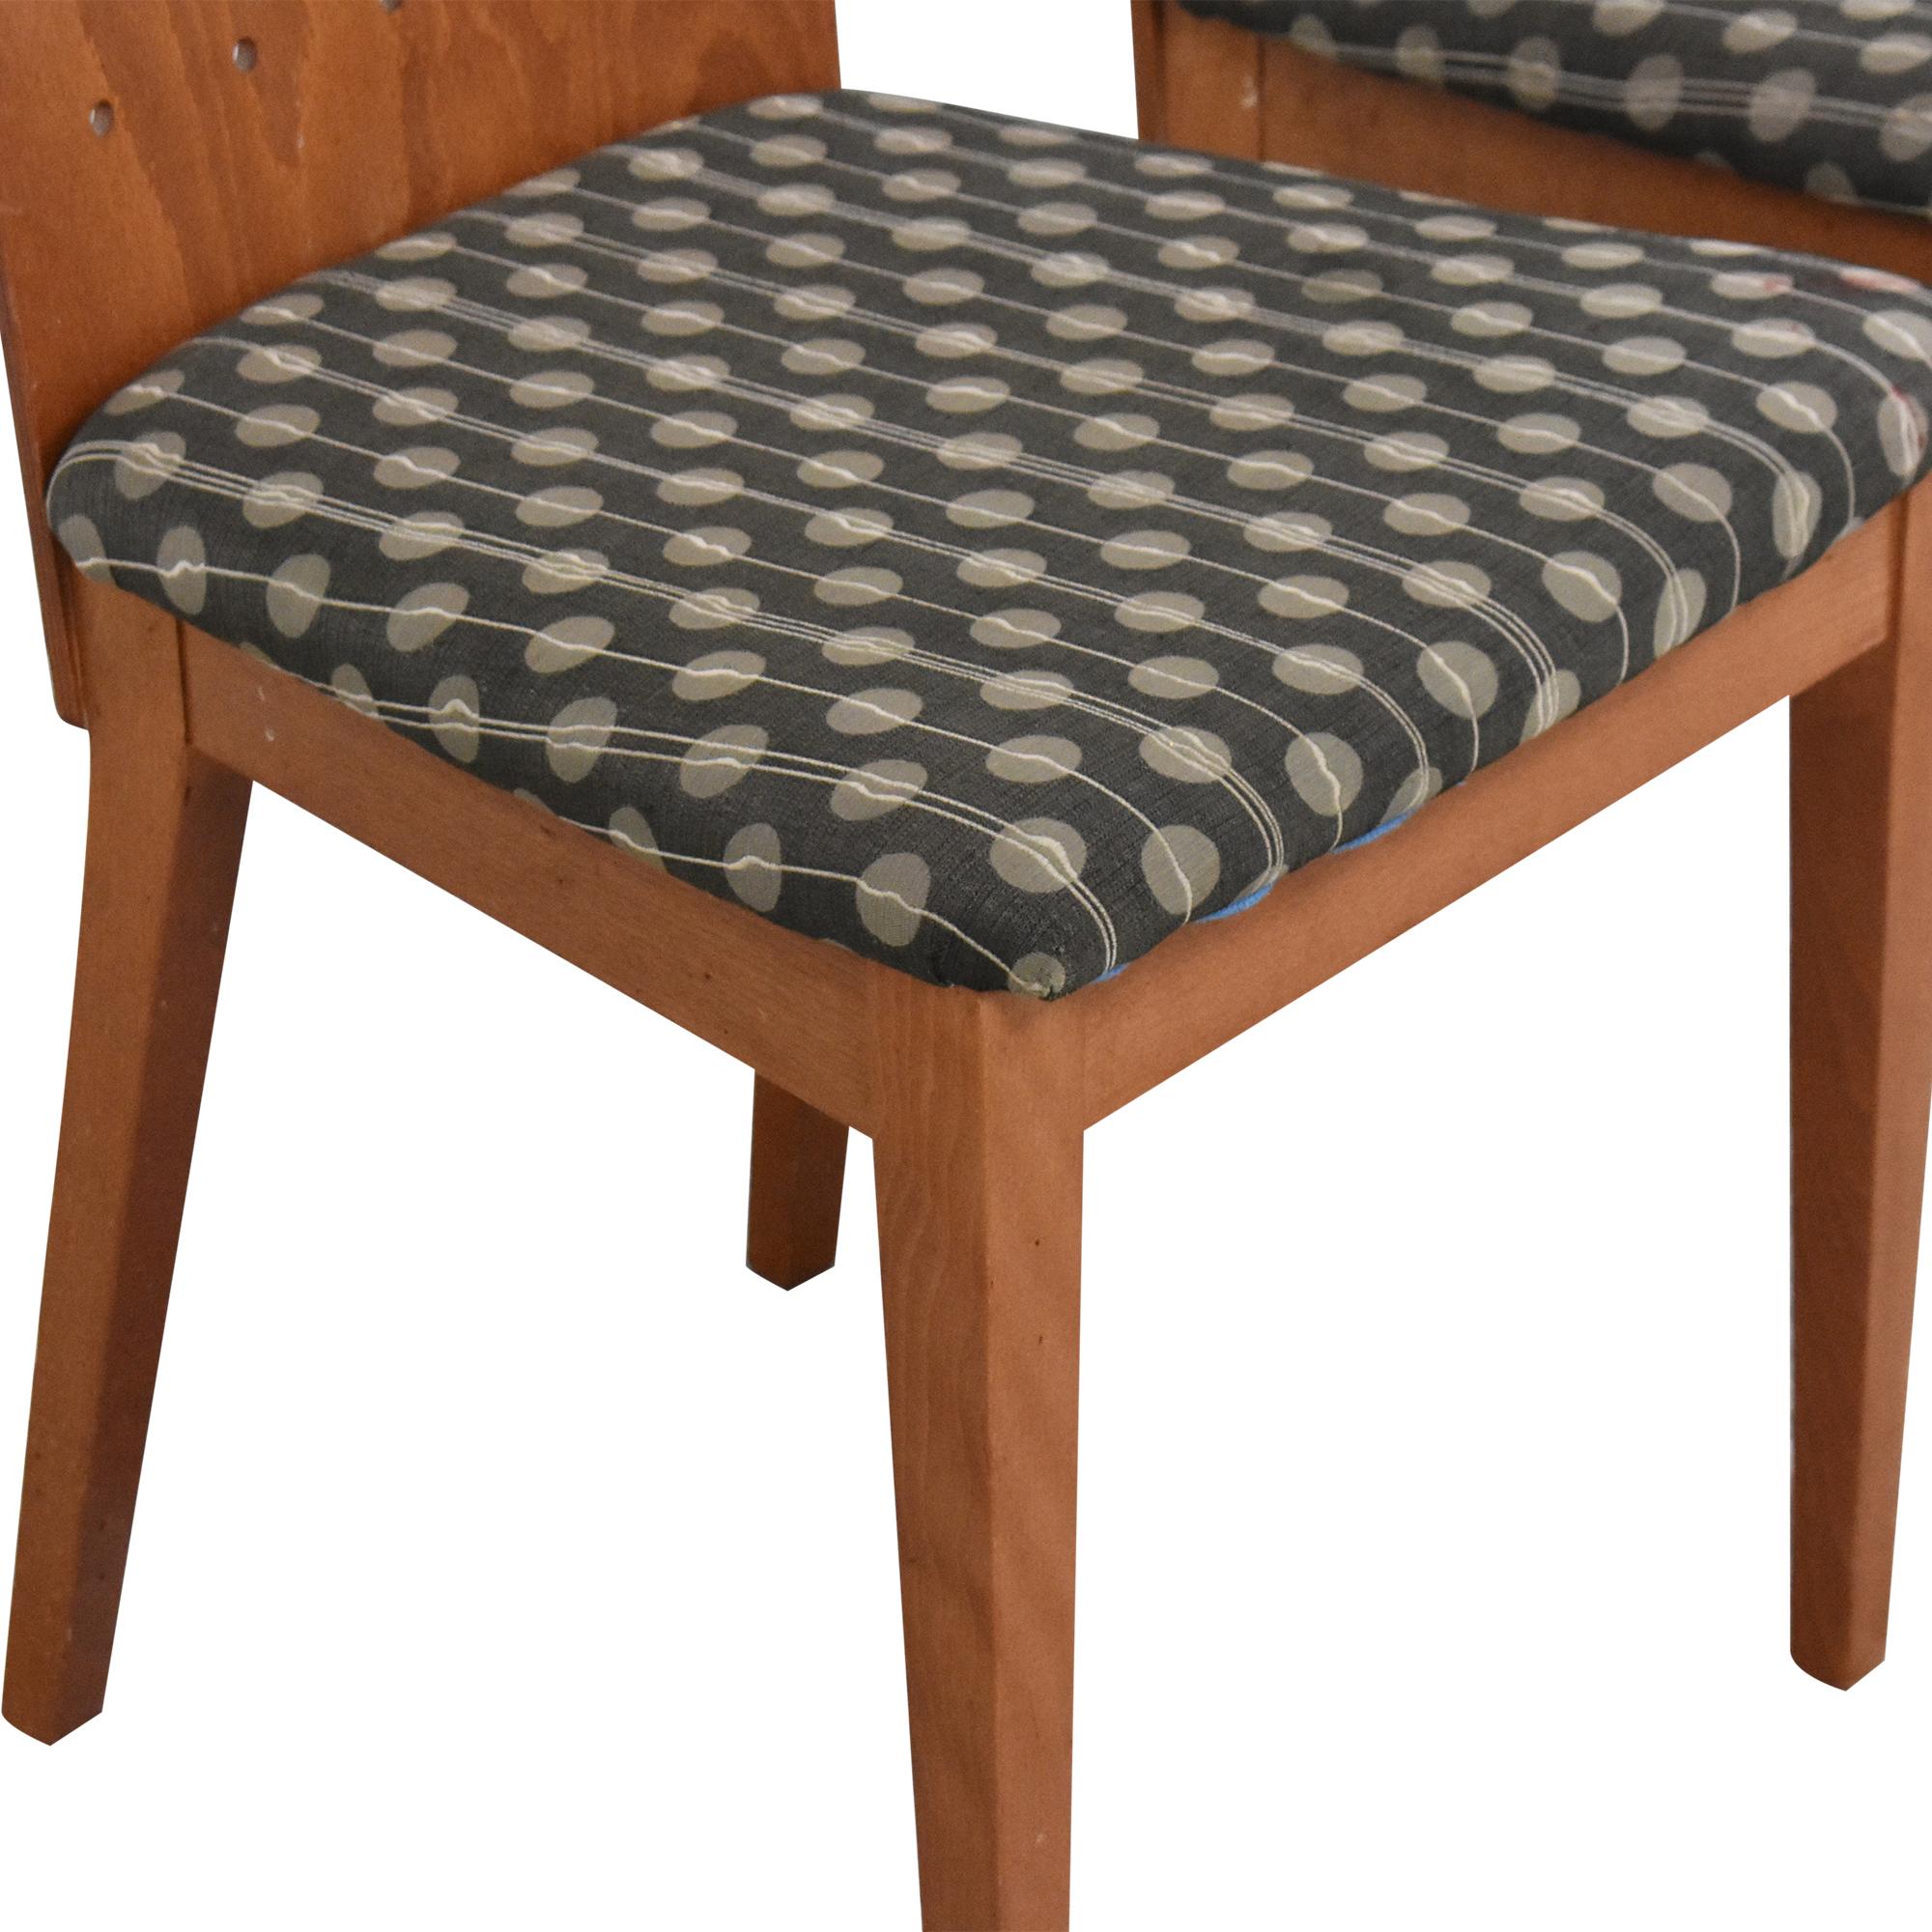 Door Store Door Store High Back Dining Chairs dimensions